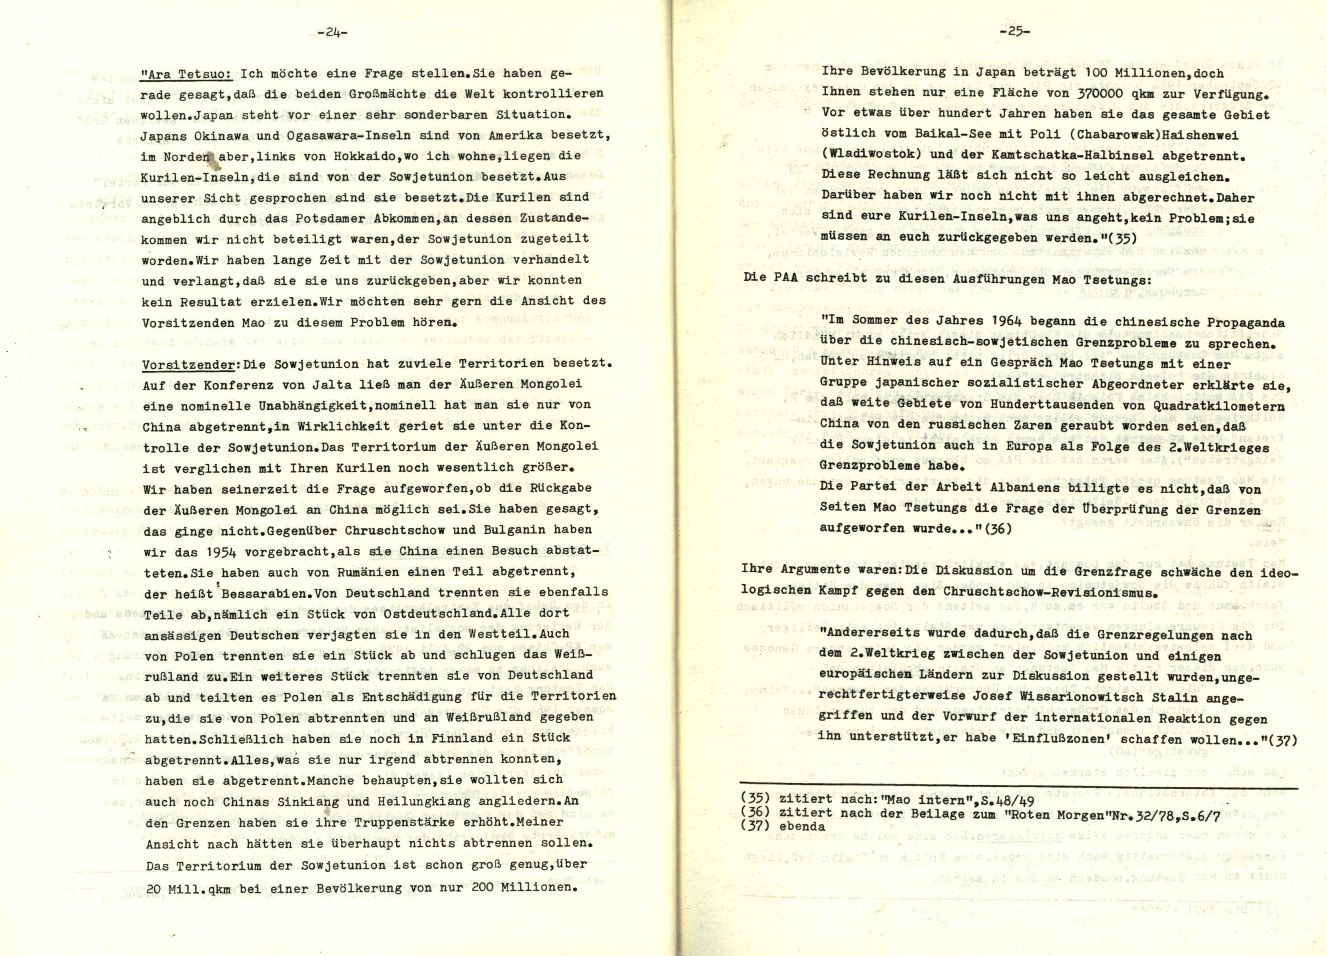 Muenchen_Kampf_dem_Revisionismus_1978_08_13